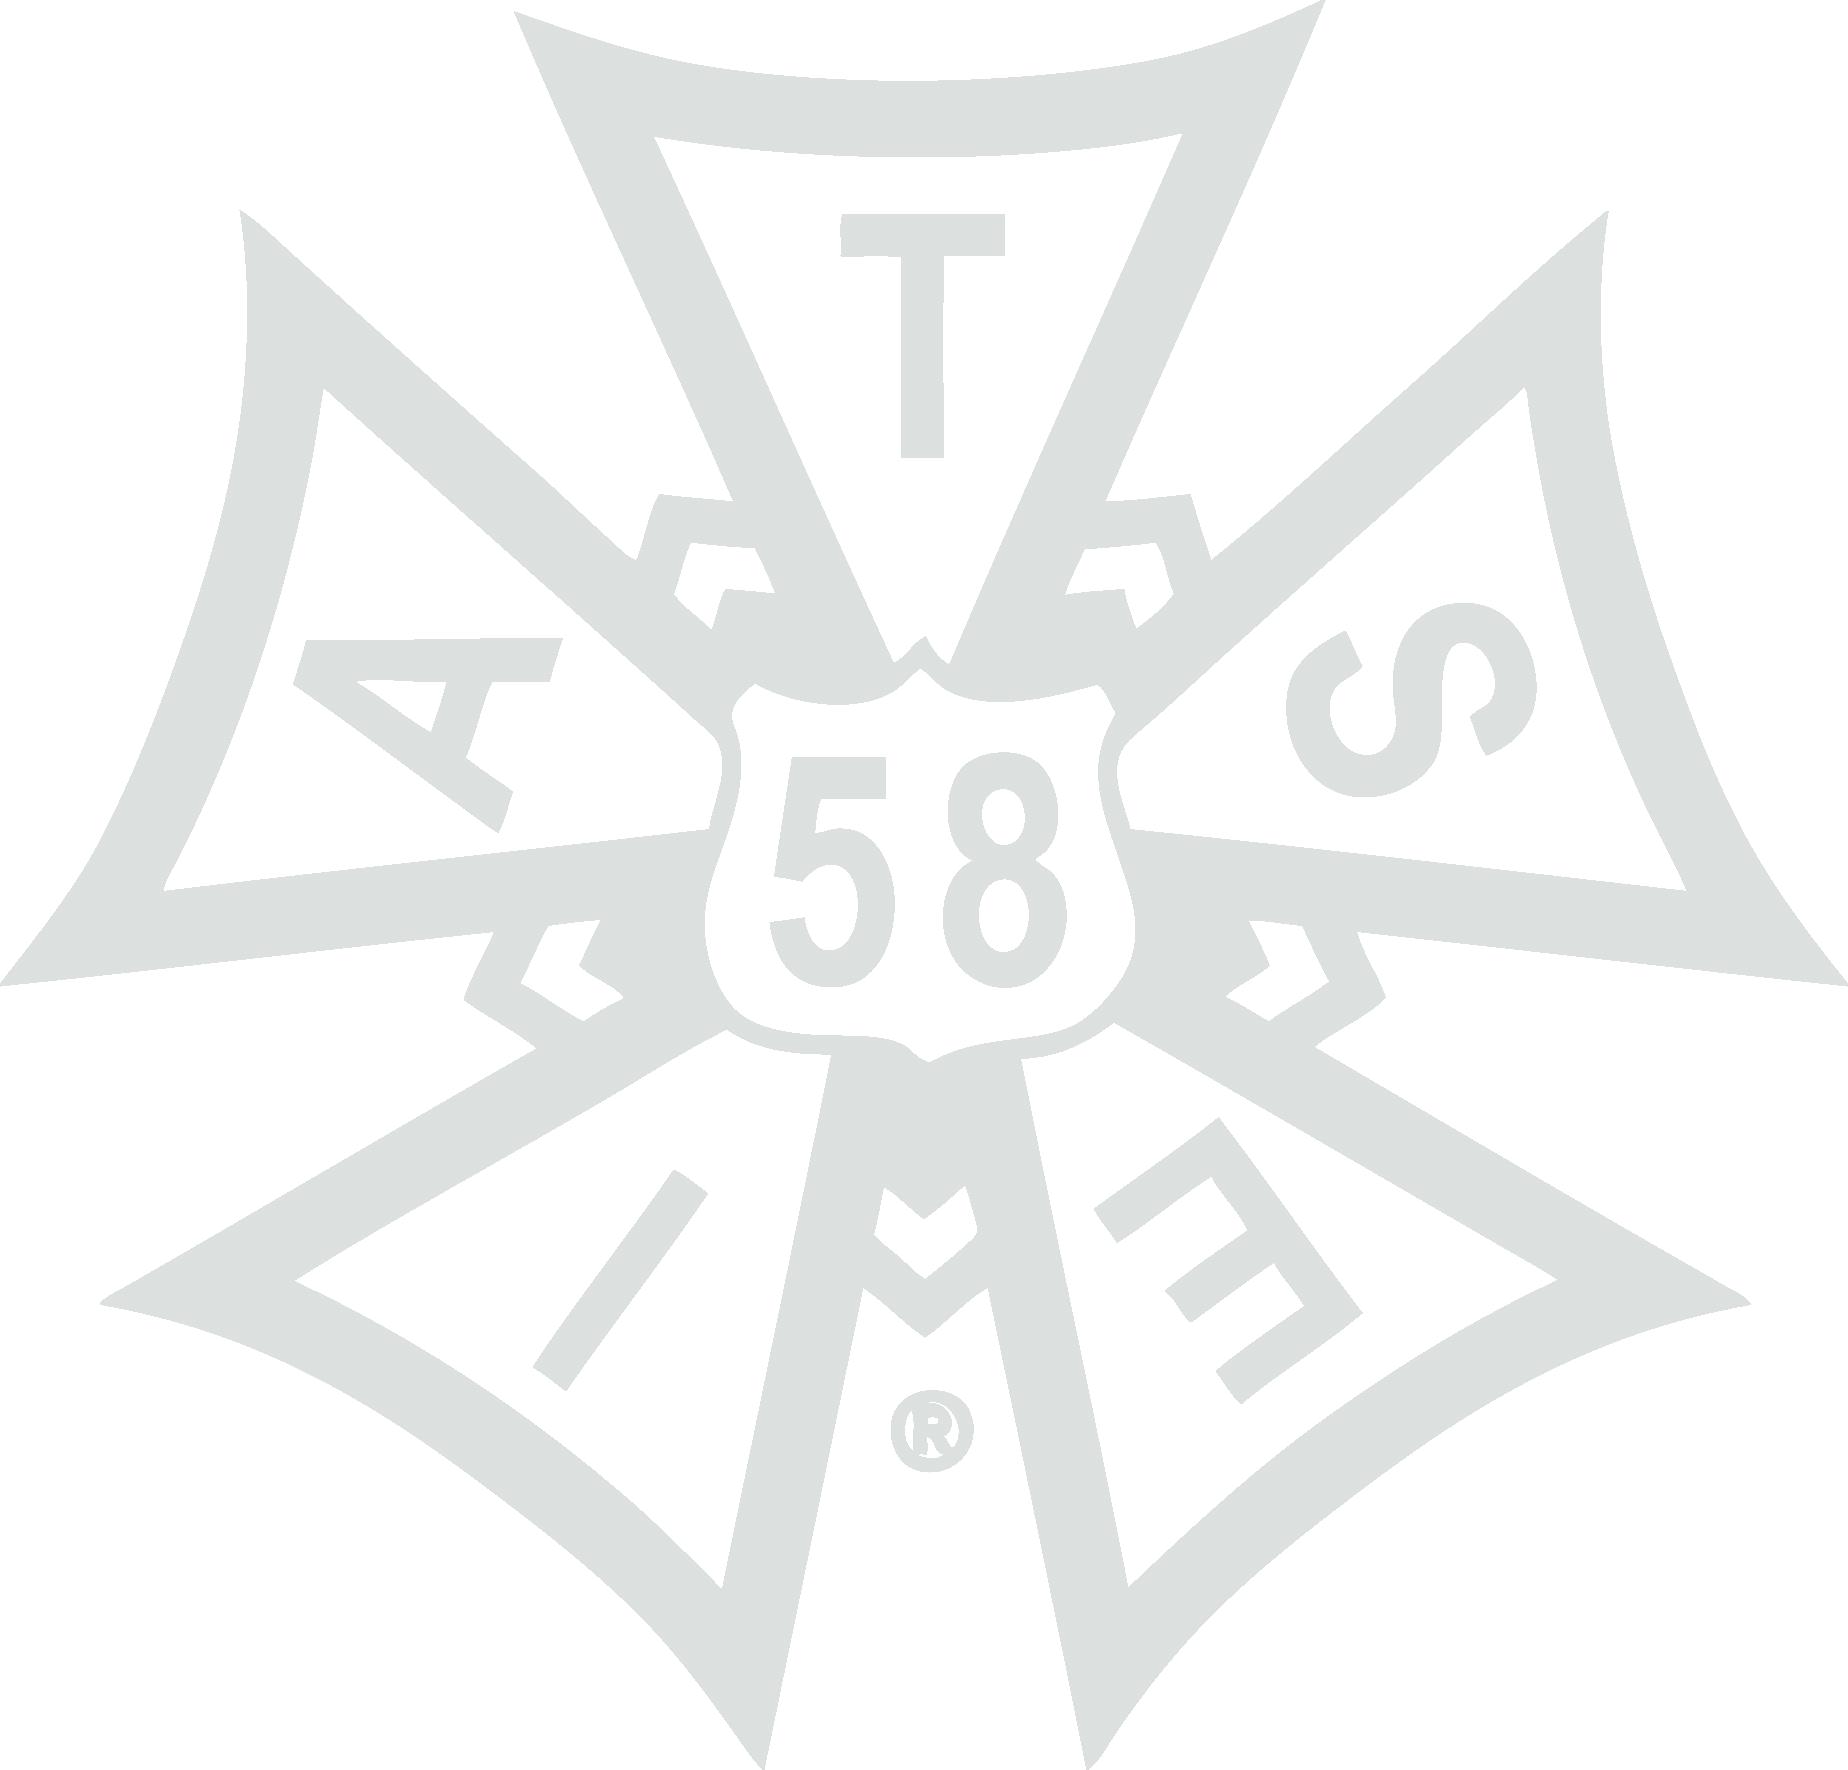 IATSE Local 58